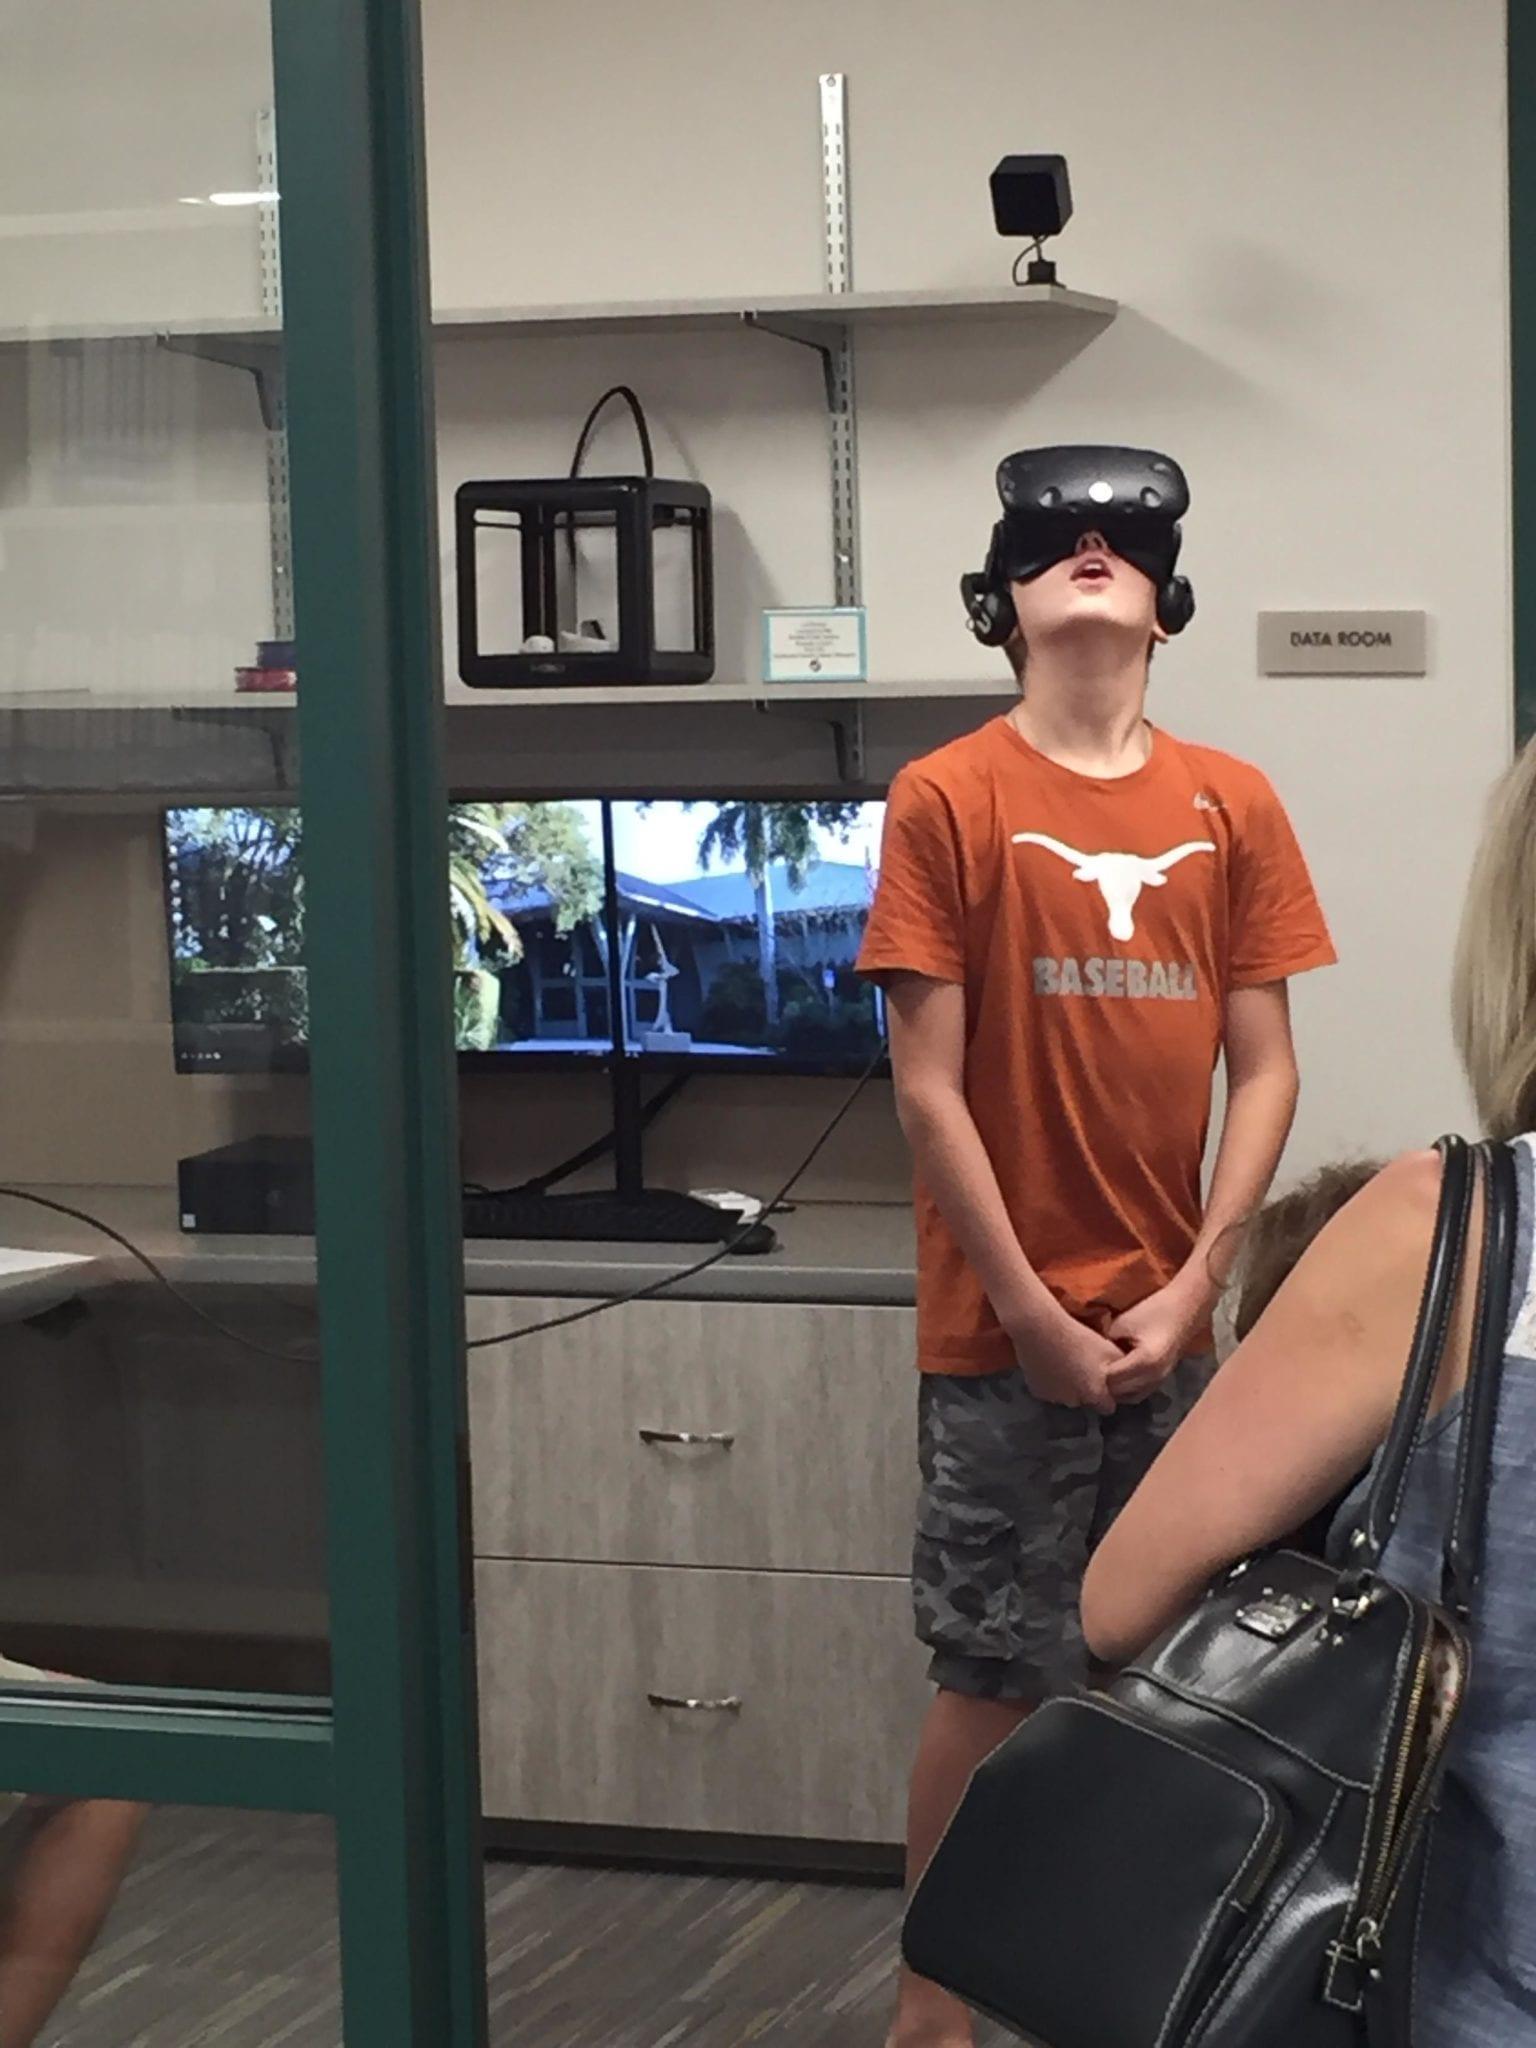 VR boy teen